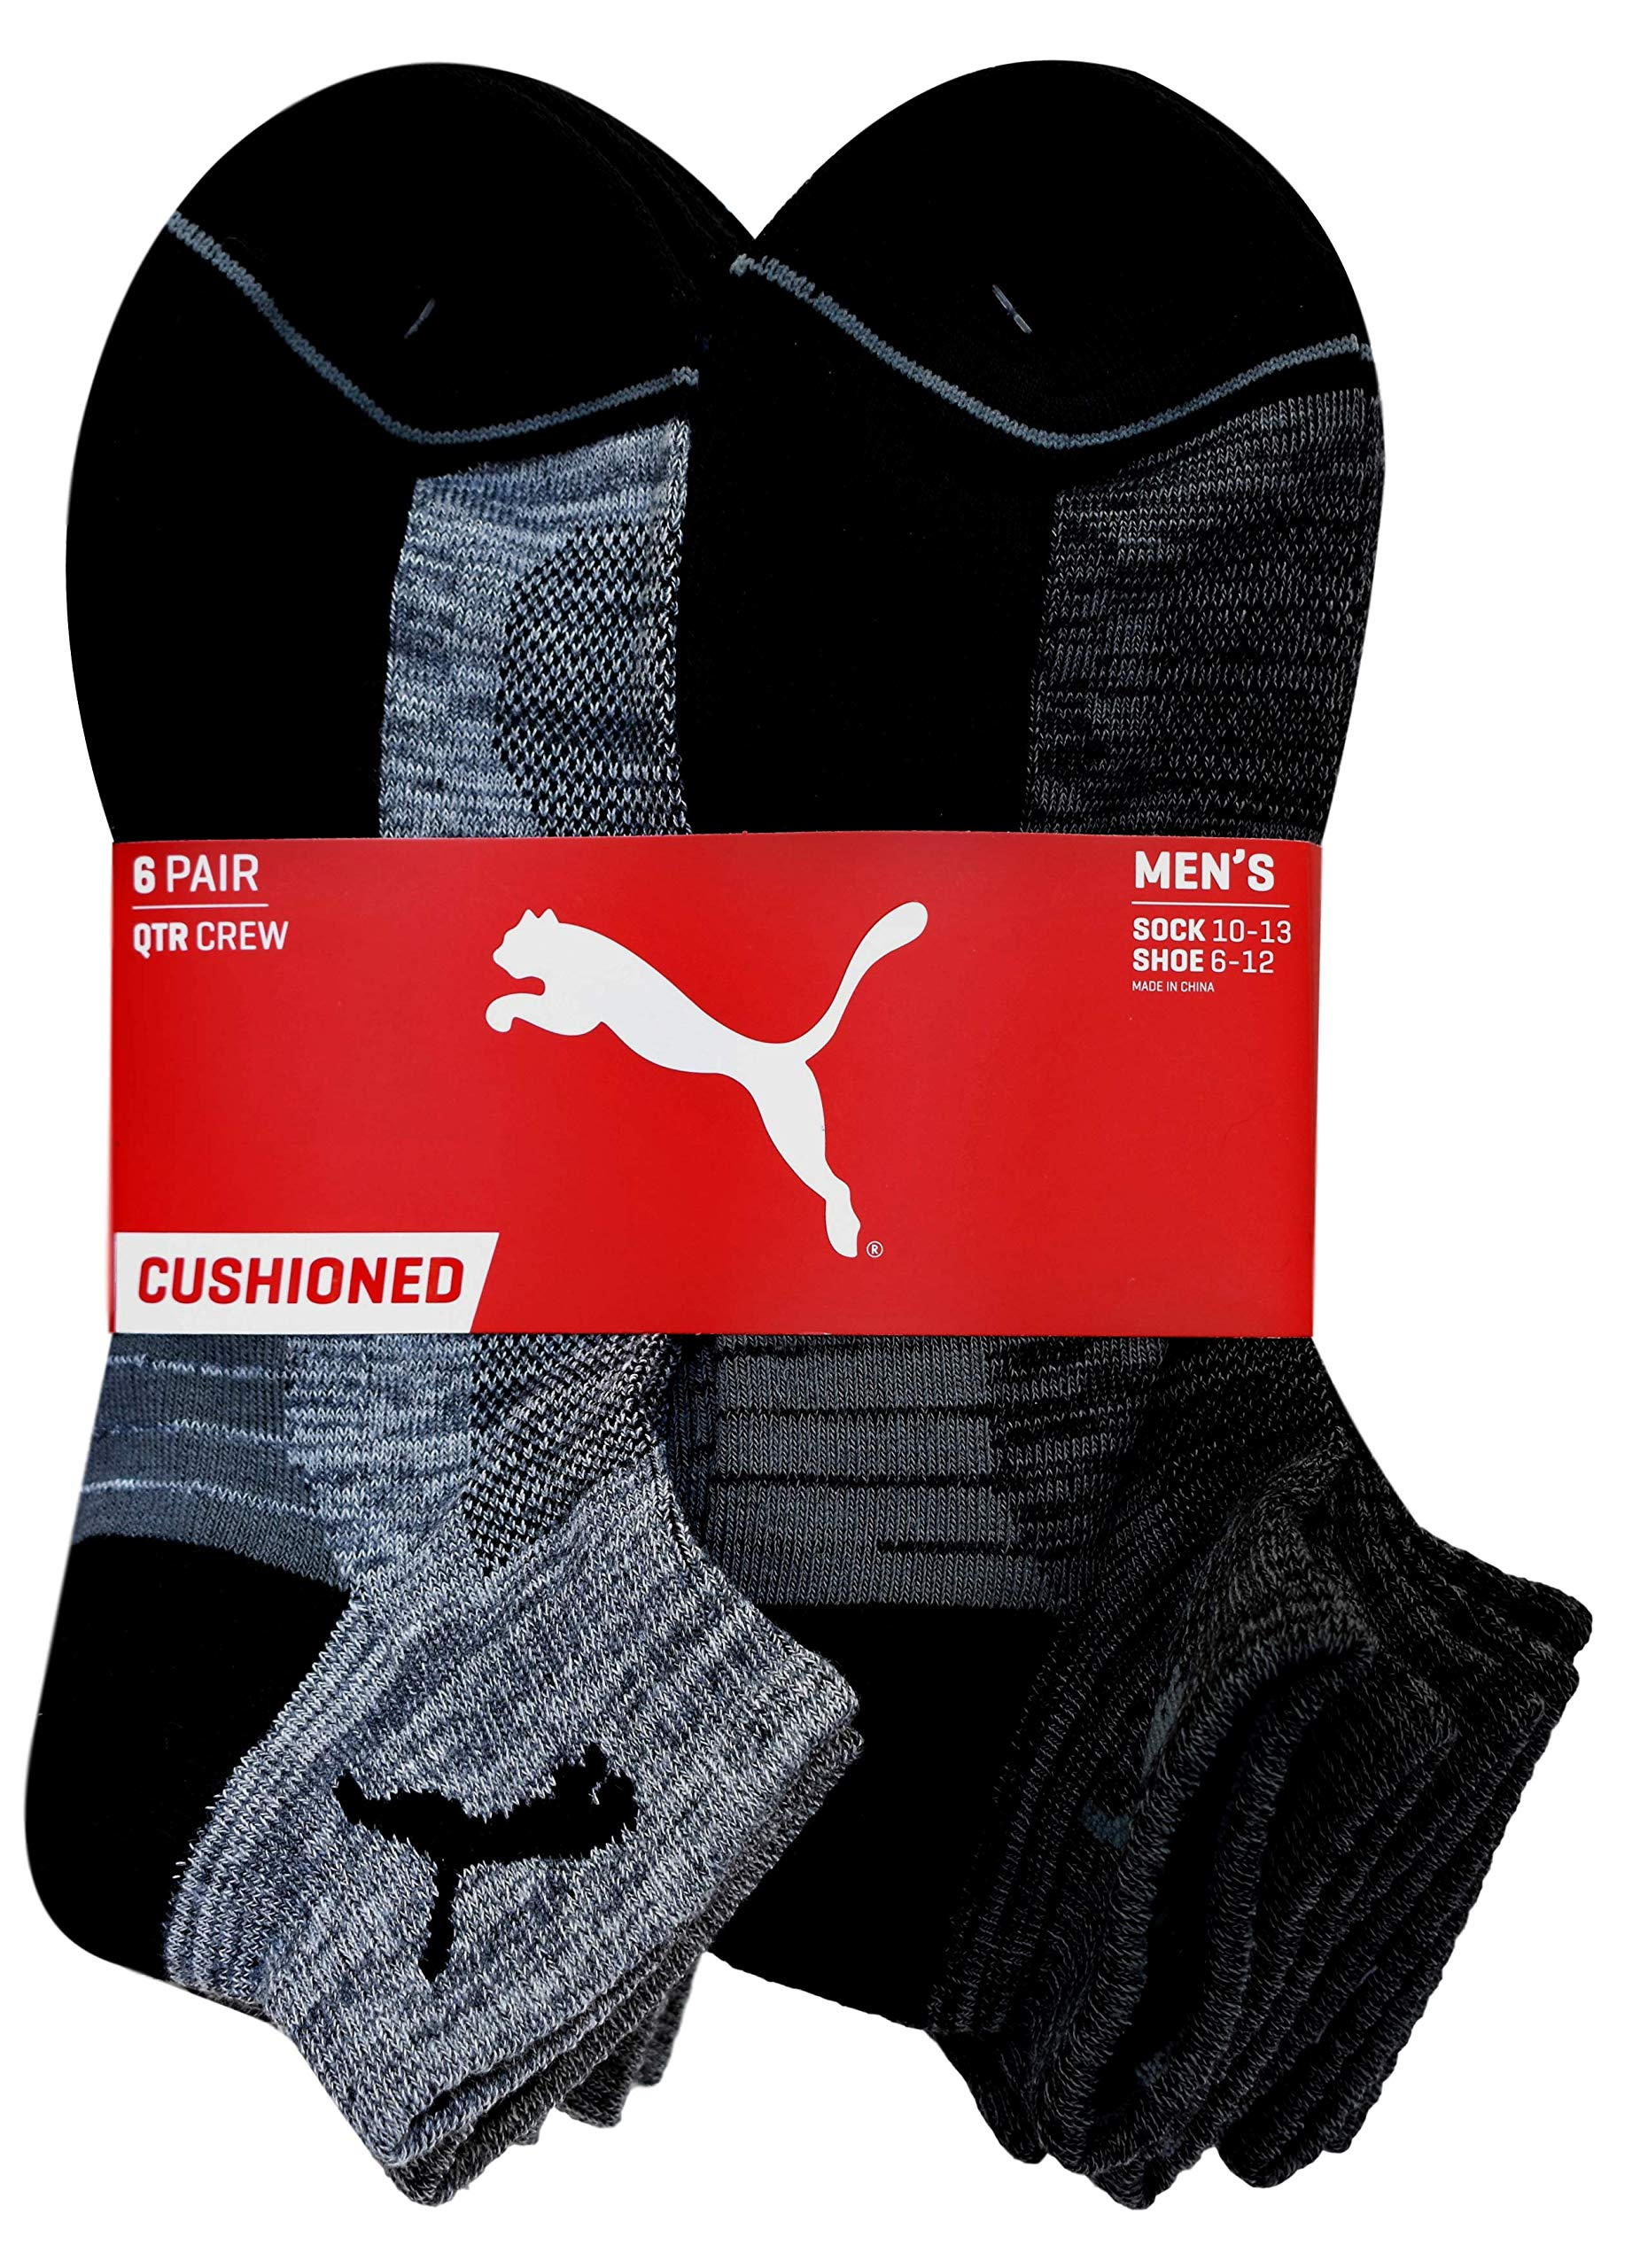 PUMA - Men's Quarter Crew Socks - Pack of 6 Pairs (Black/Gray) 10-13